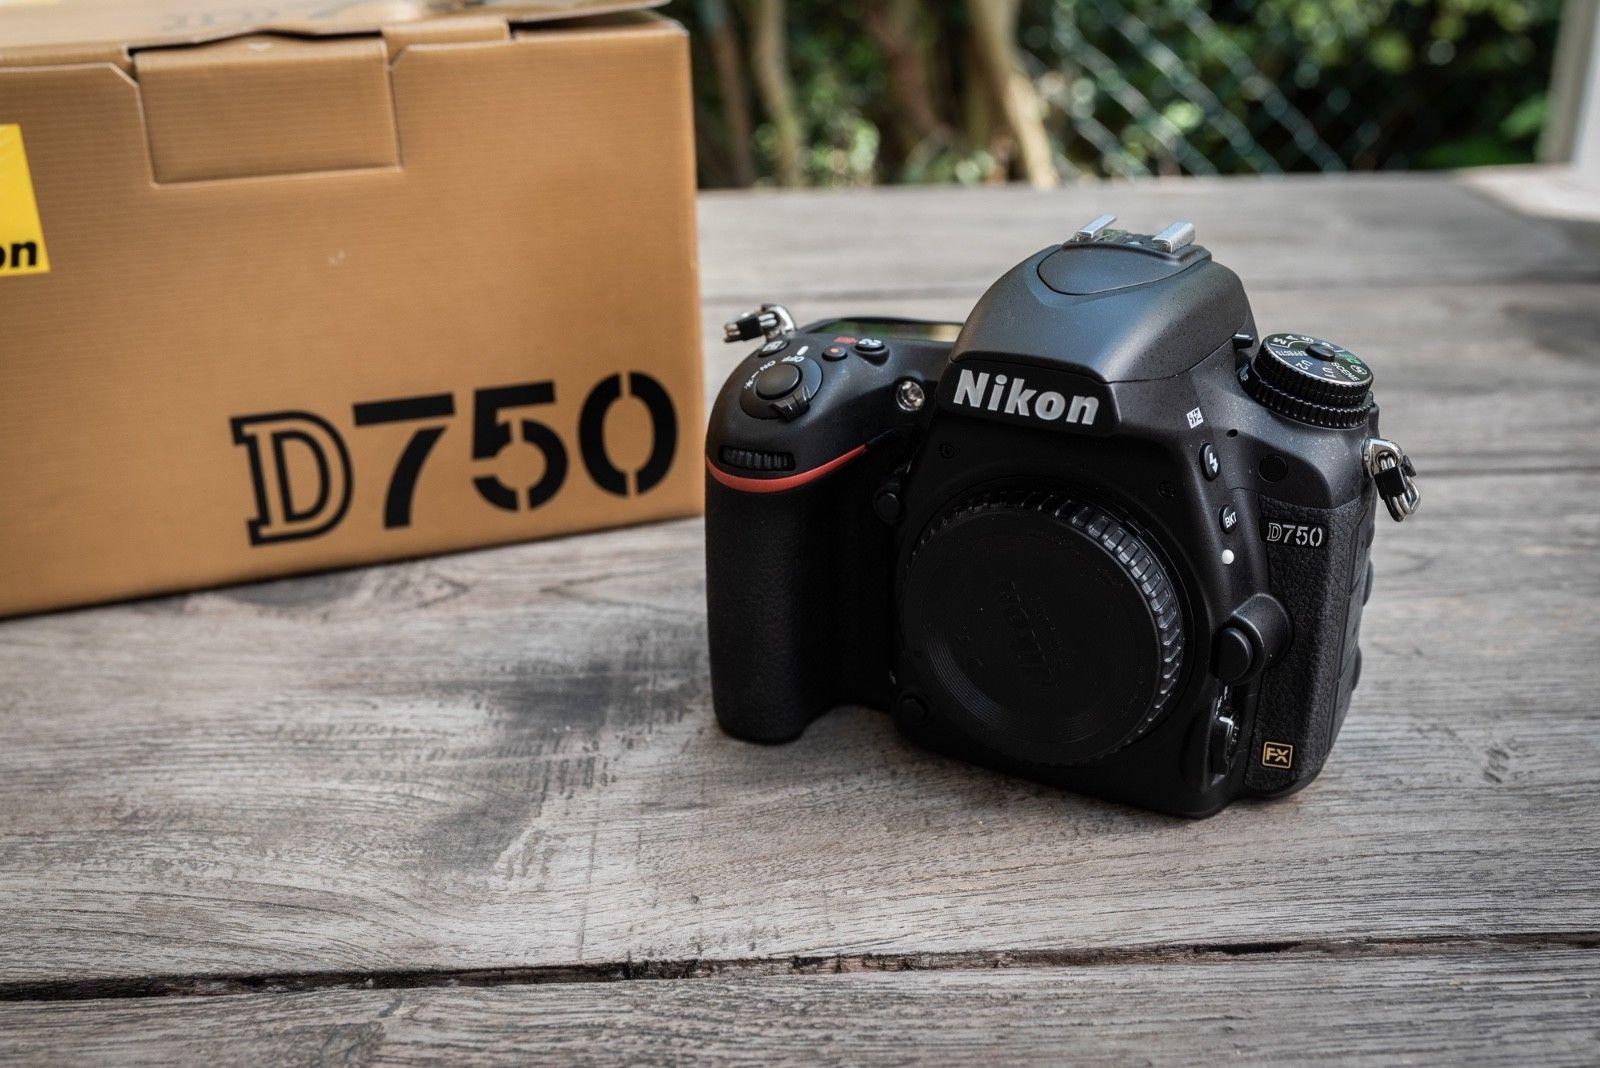 Nikon D750 24.3 MP SLR-Digitalkamera - Schwarz (Nur Gehäuse)